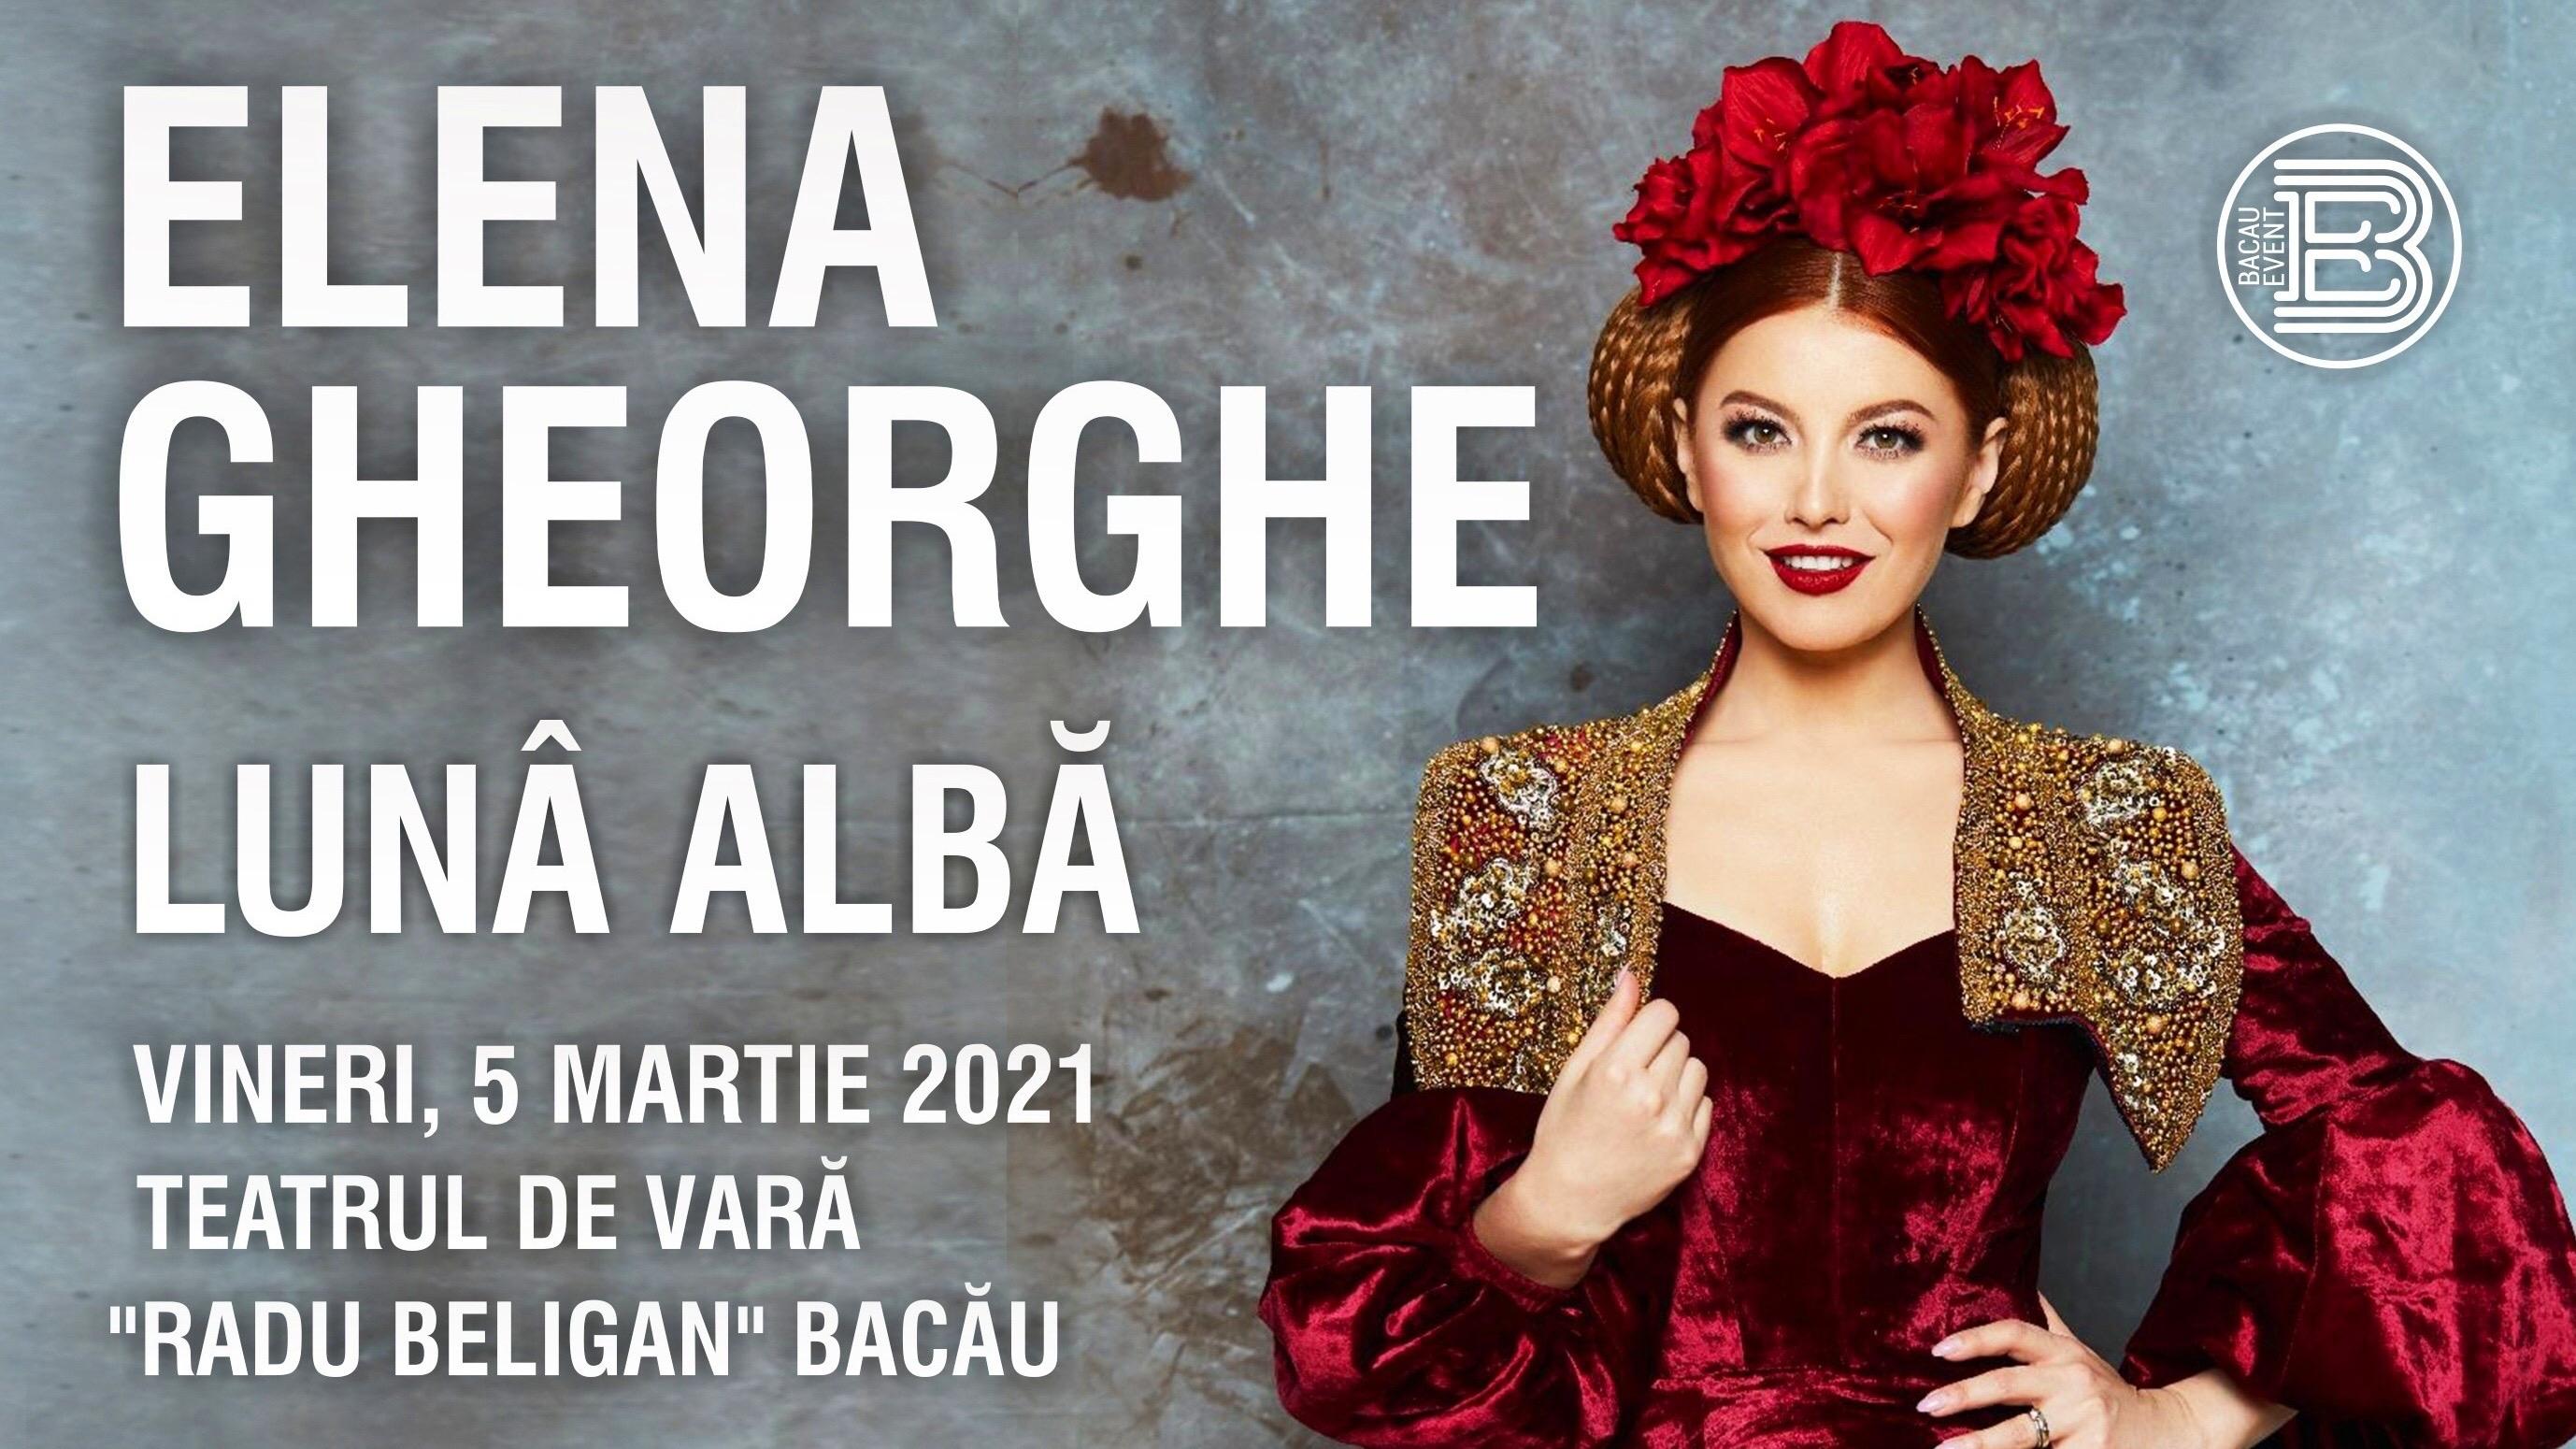 Elena Gheorghe - 05 Martie 2021